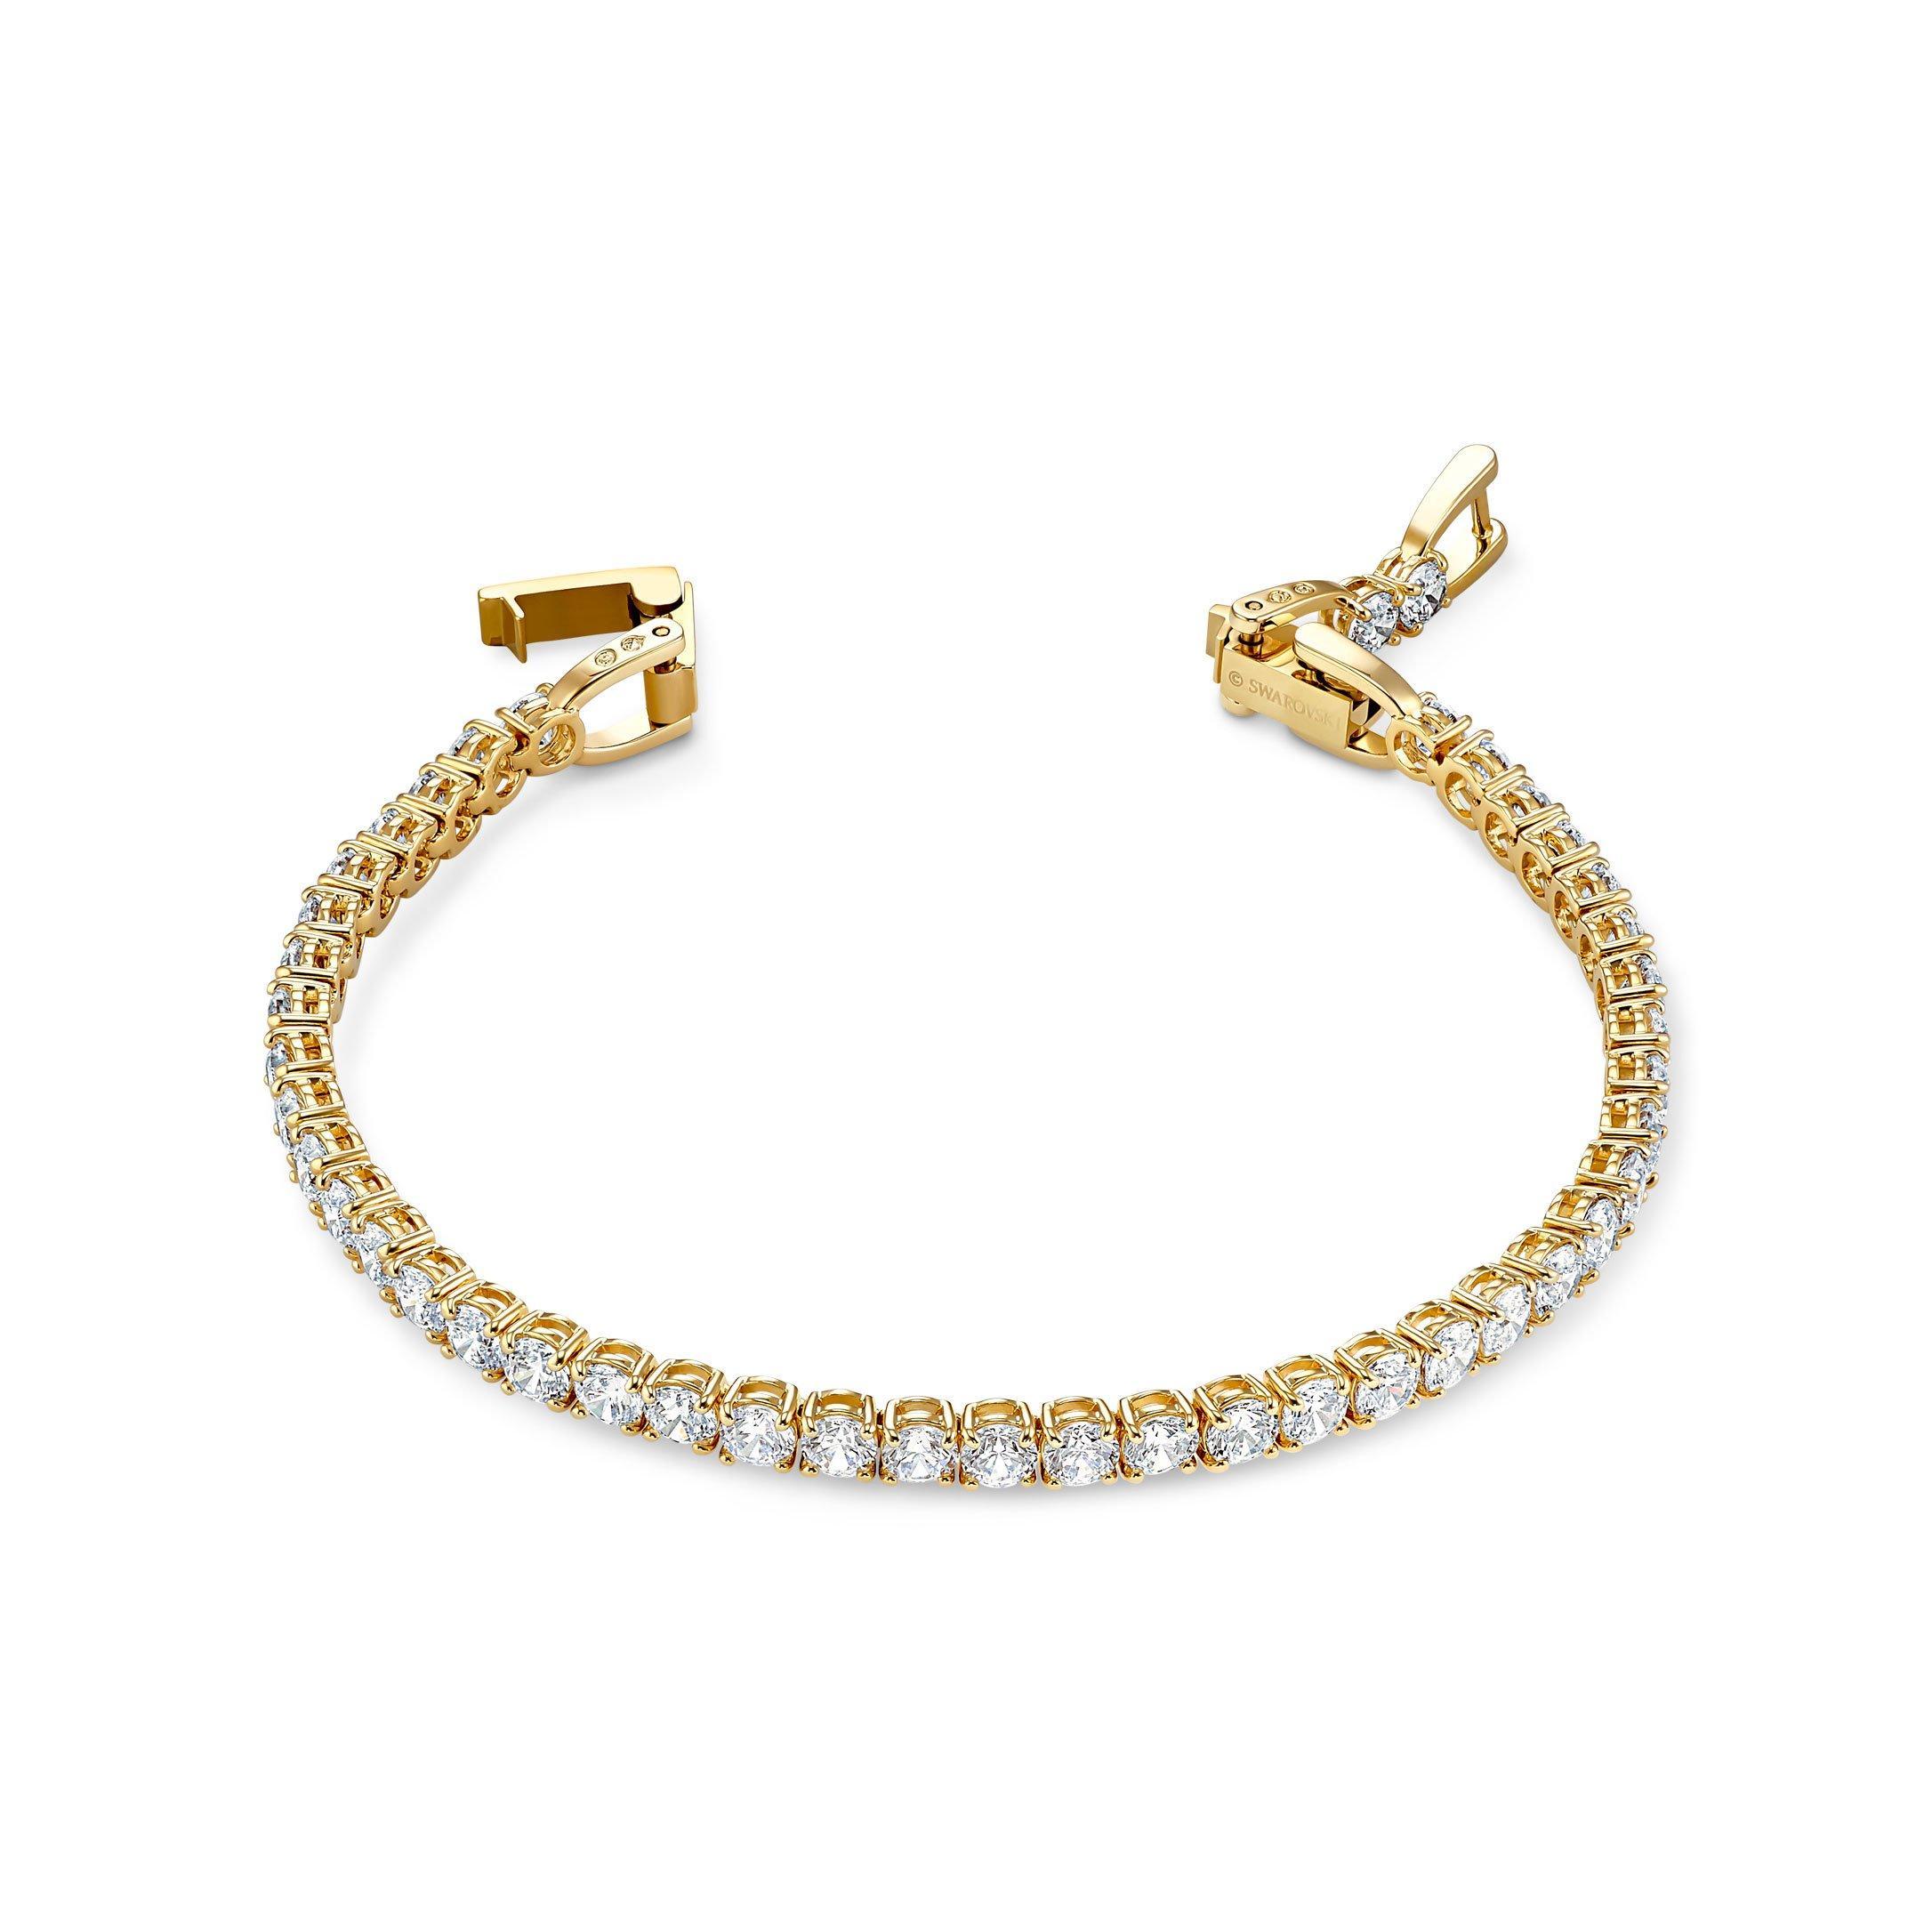 Swarovski Tennis Gold Tone Bracelet